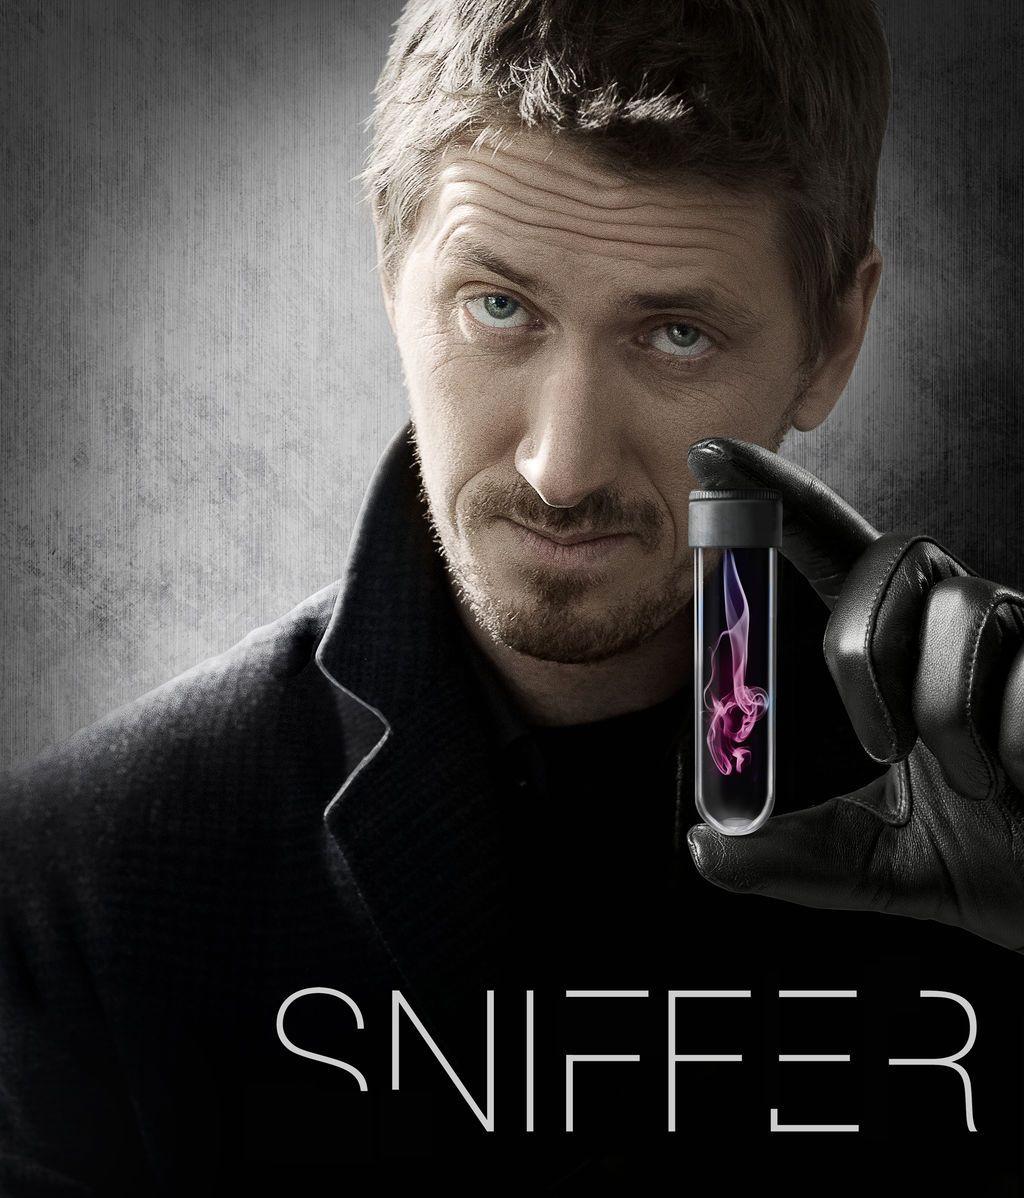 Sniffer cartel